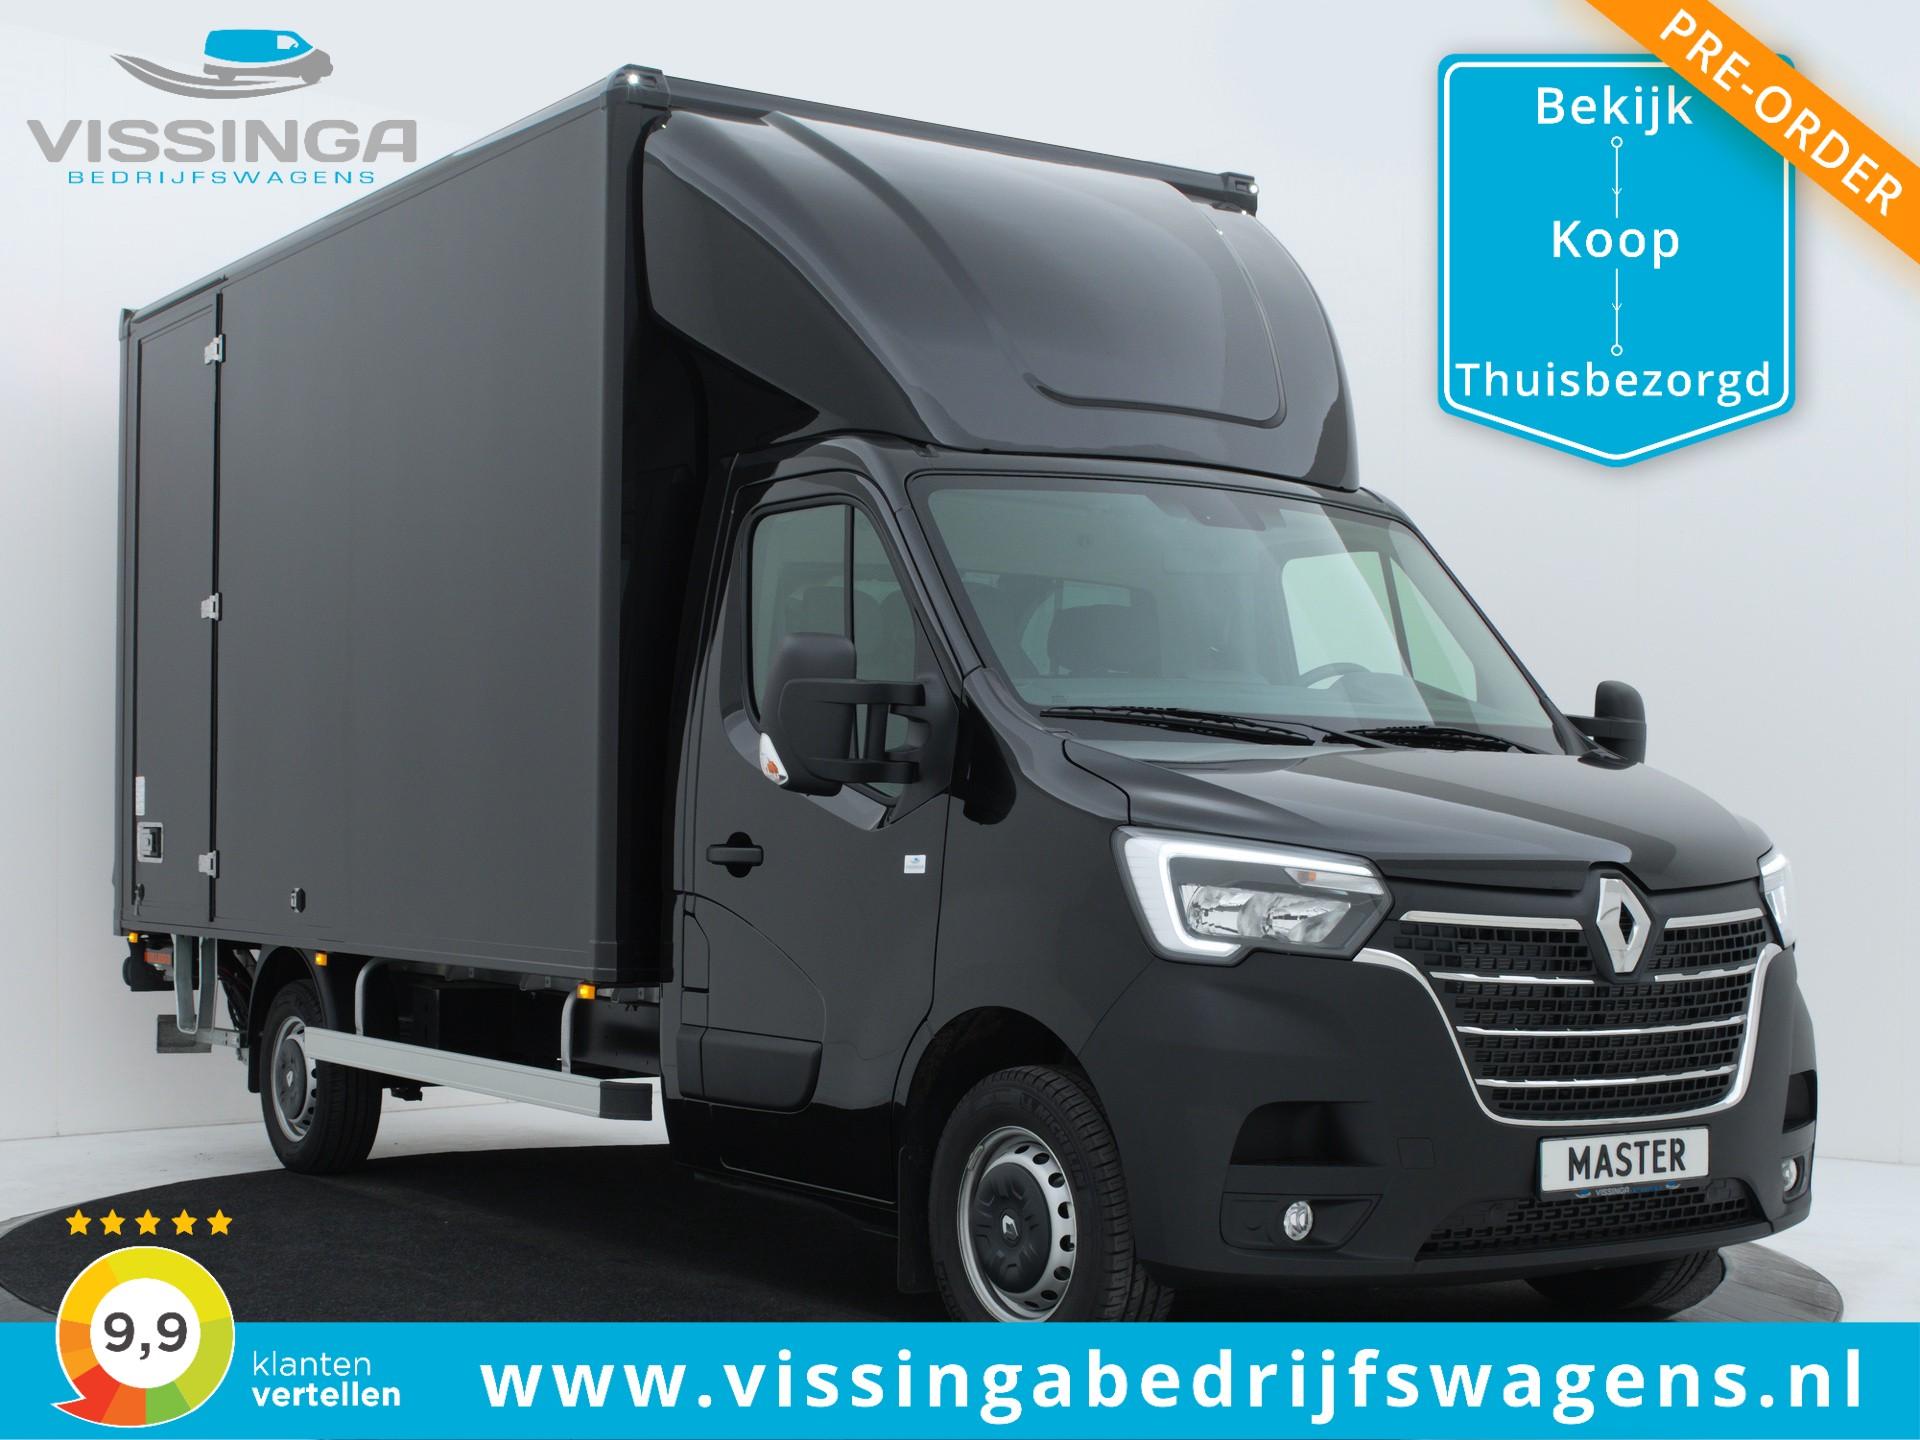 Renault Master FWD 165 pk Bakwagen 420x211x232 (20.5 m3)